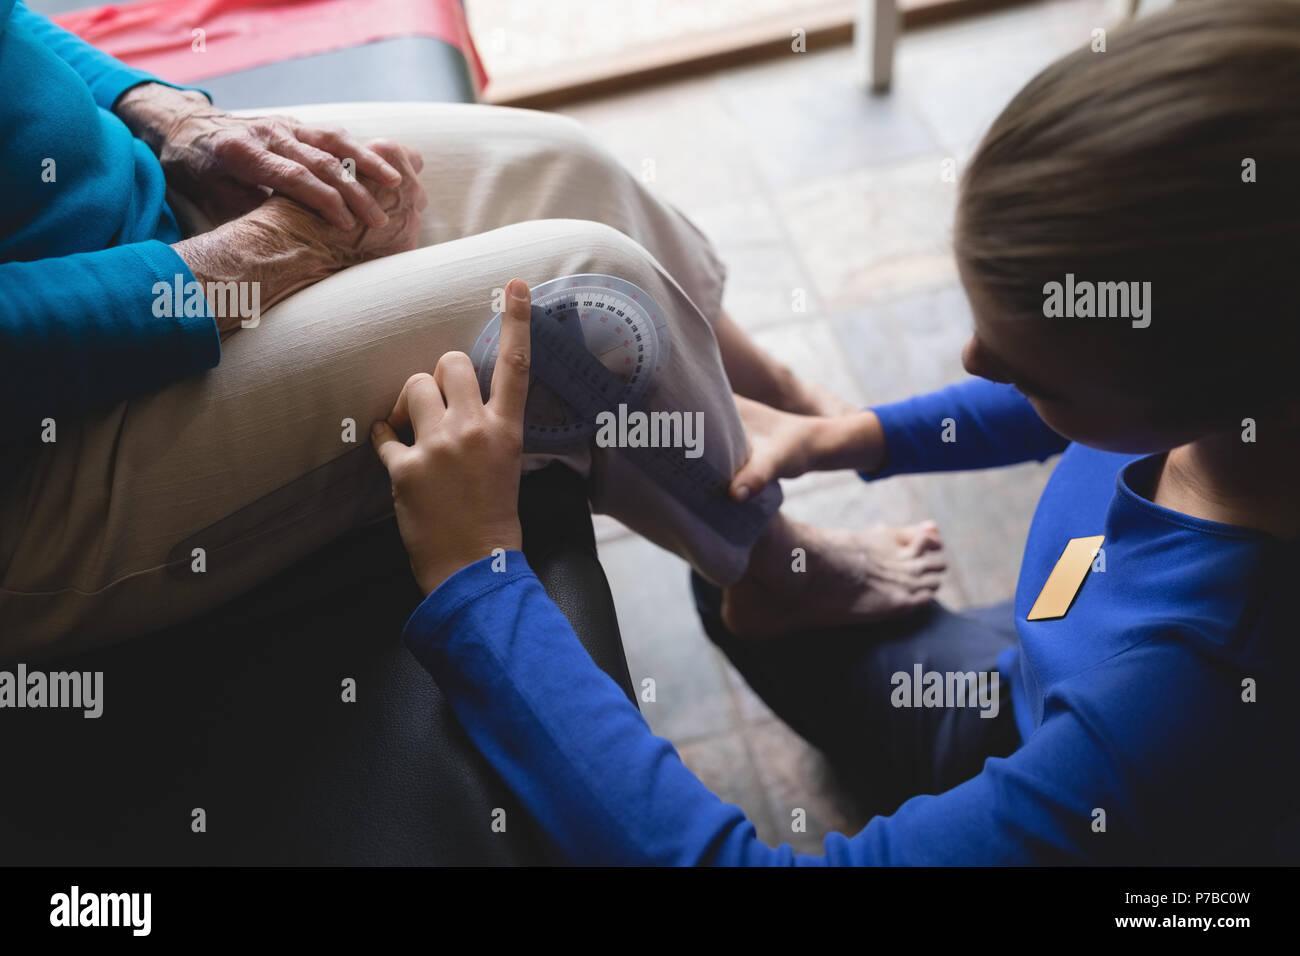 Fisioterapeuta medición de rodilla con goniómetro Imagen De Stock